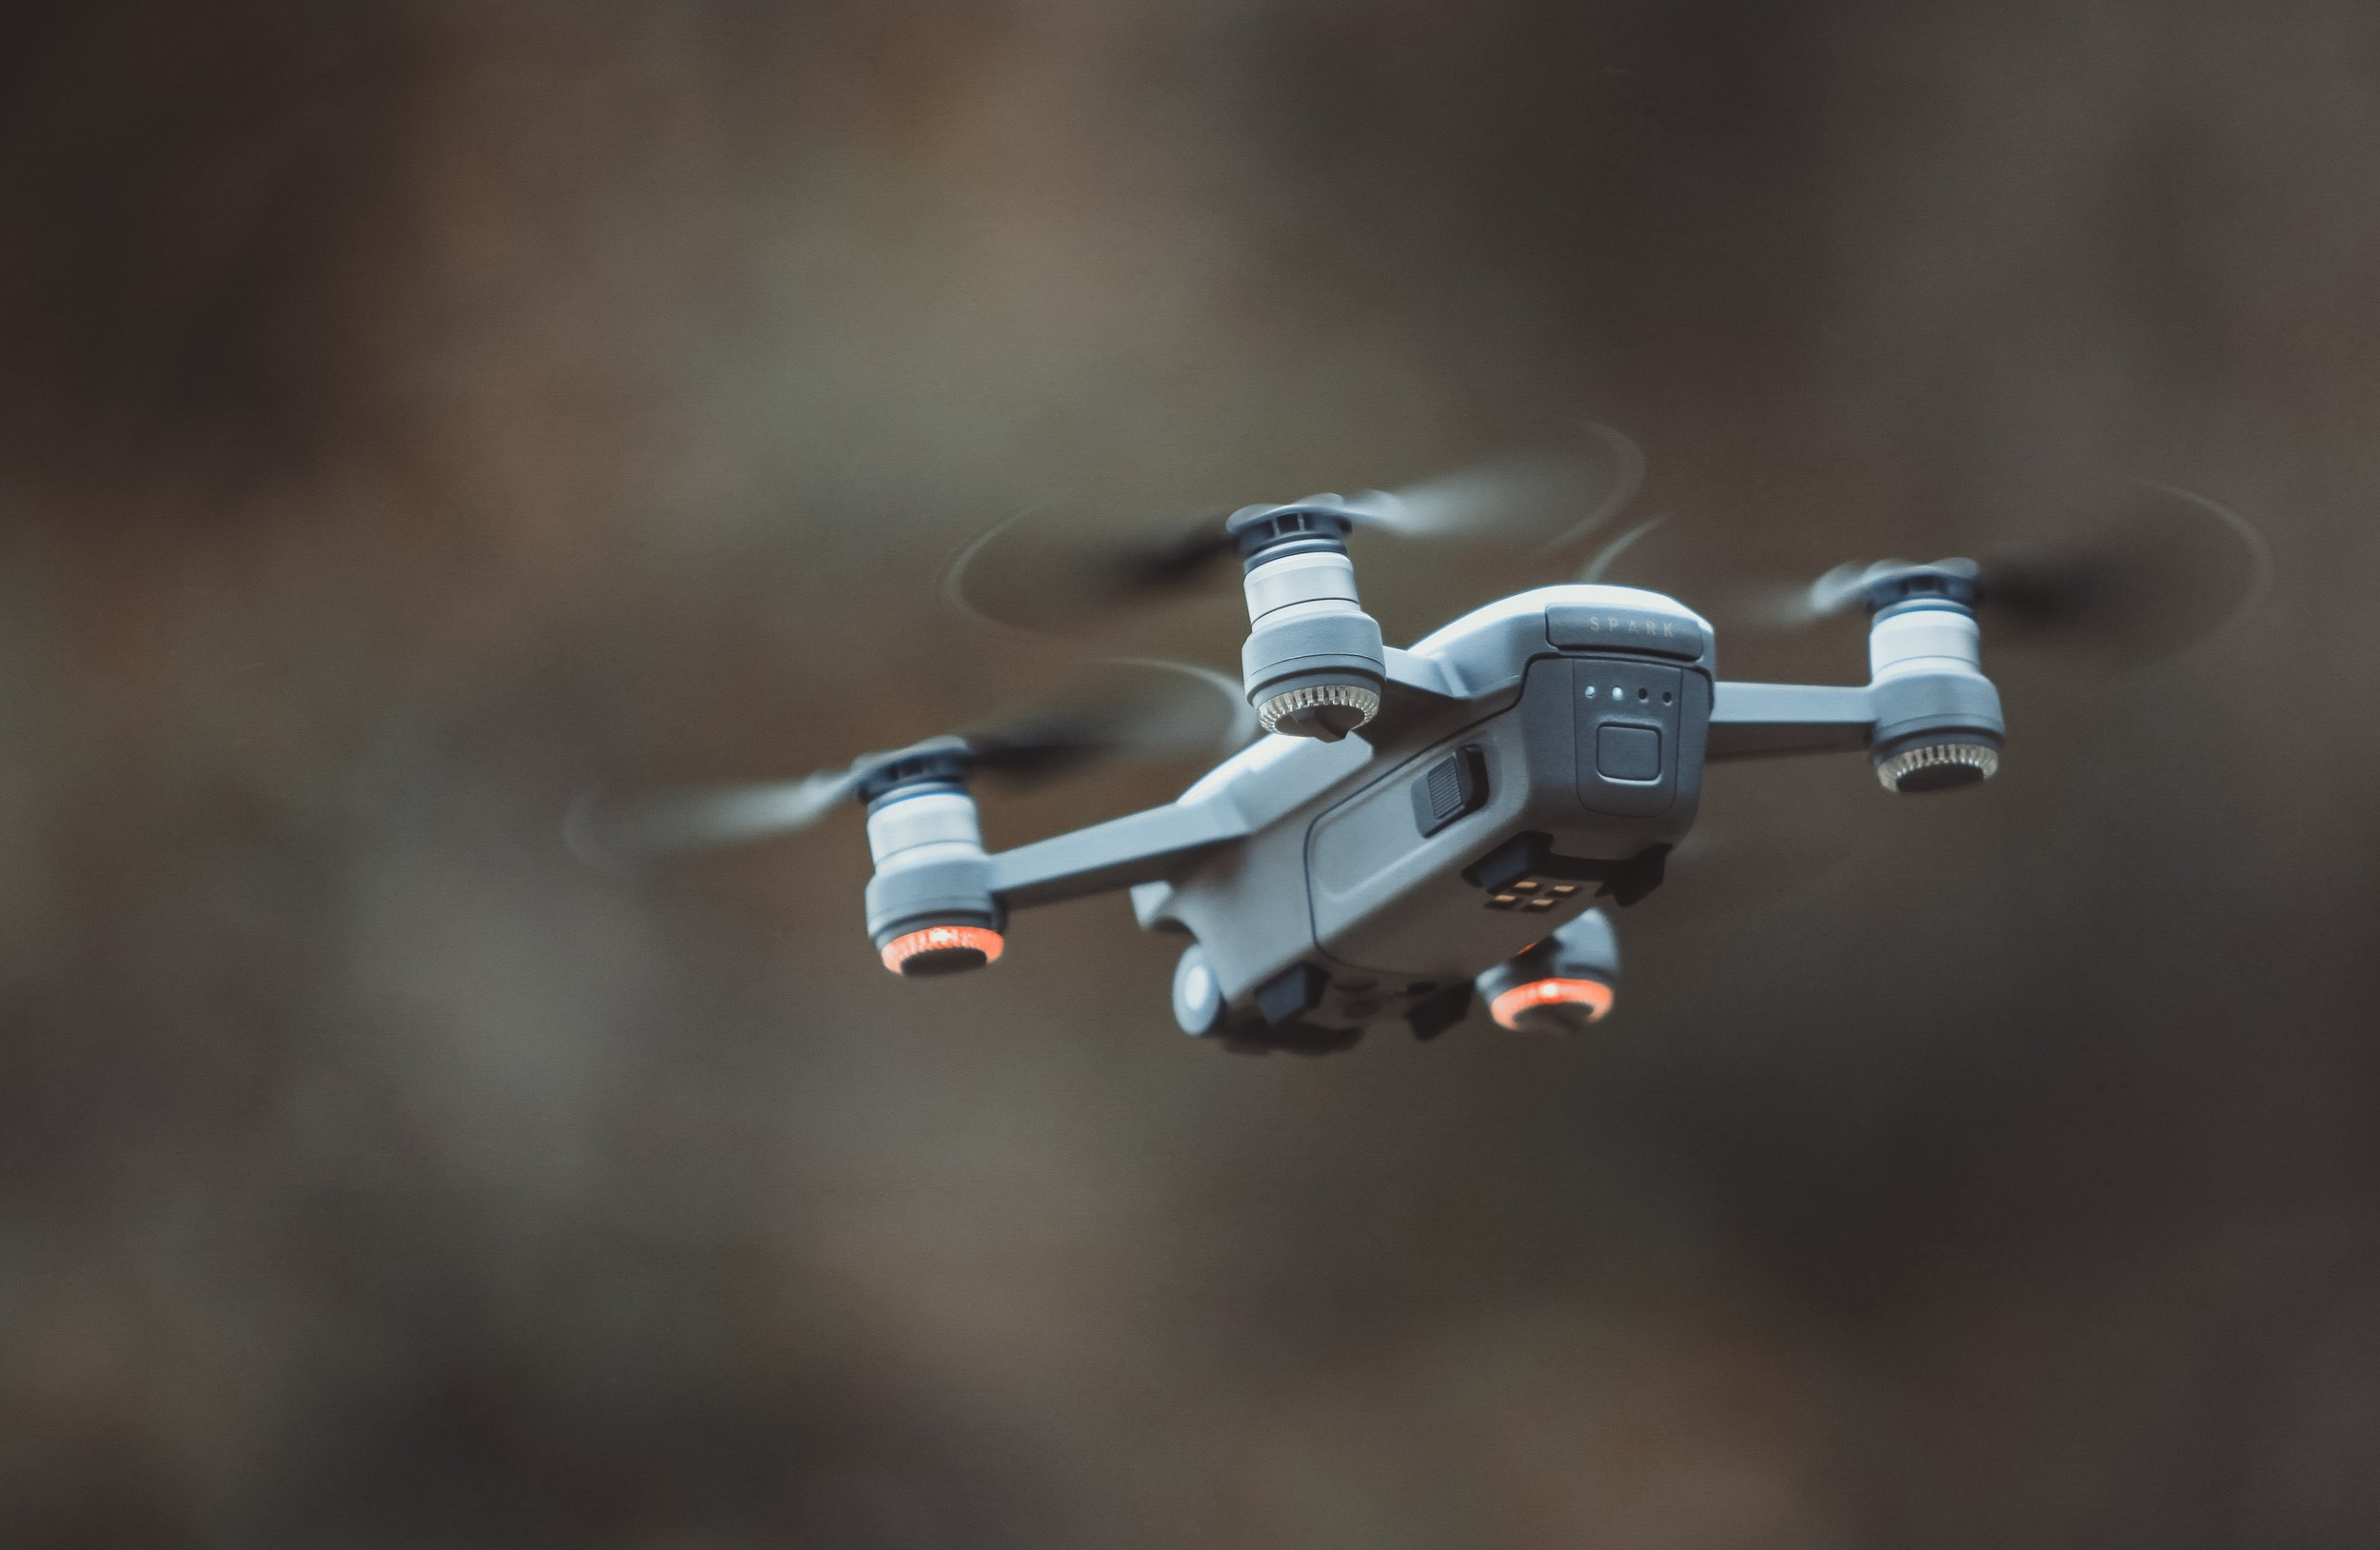 camera-drone-flying-724921.jpg